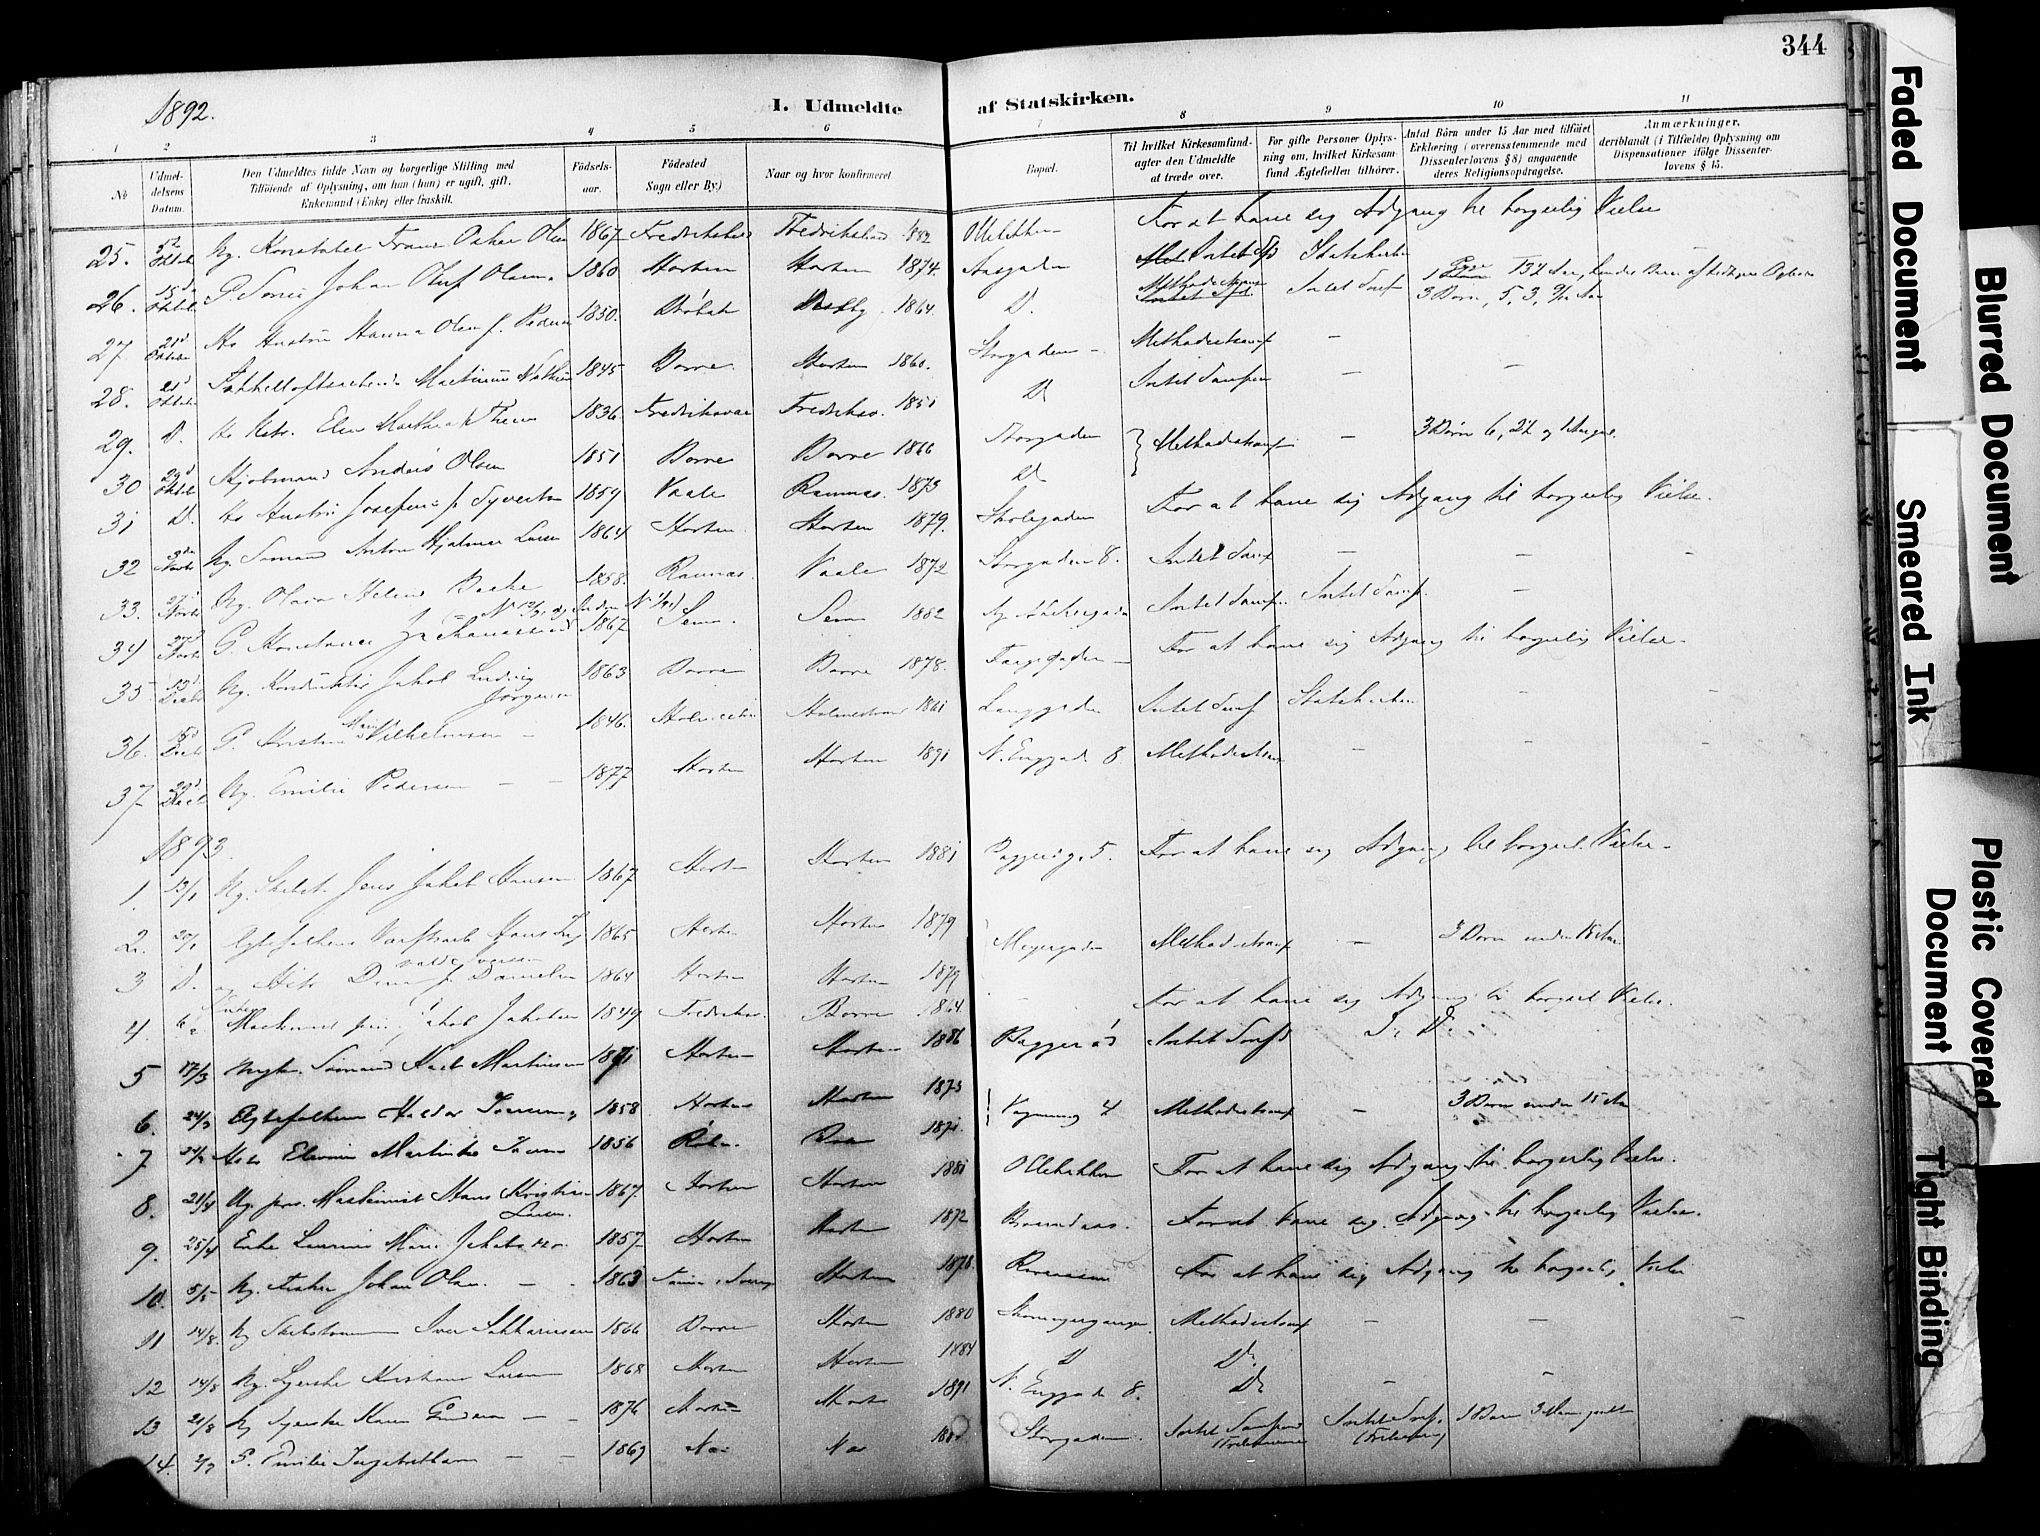 SAKO, Horten kirkebøker, F/Fa/L0004: Parish register (official) no. 4, 1888-1895, p. 344